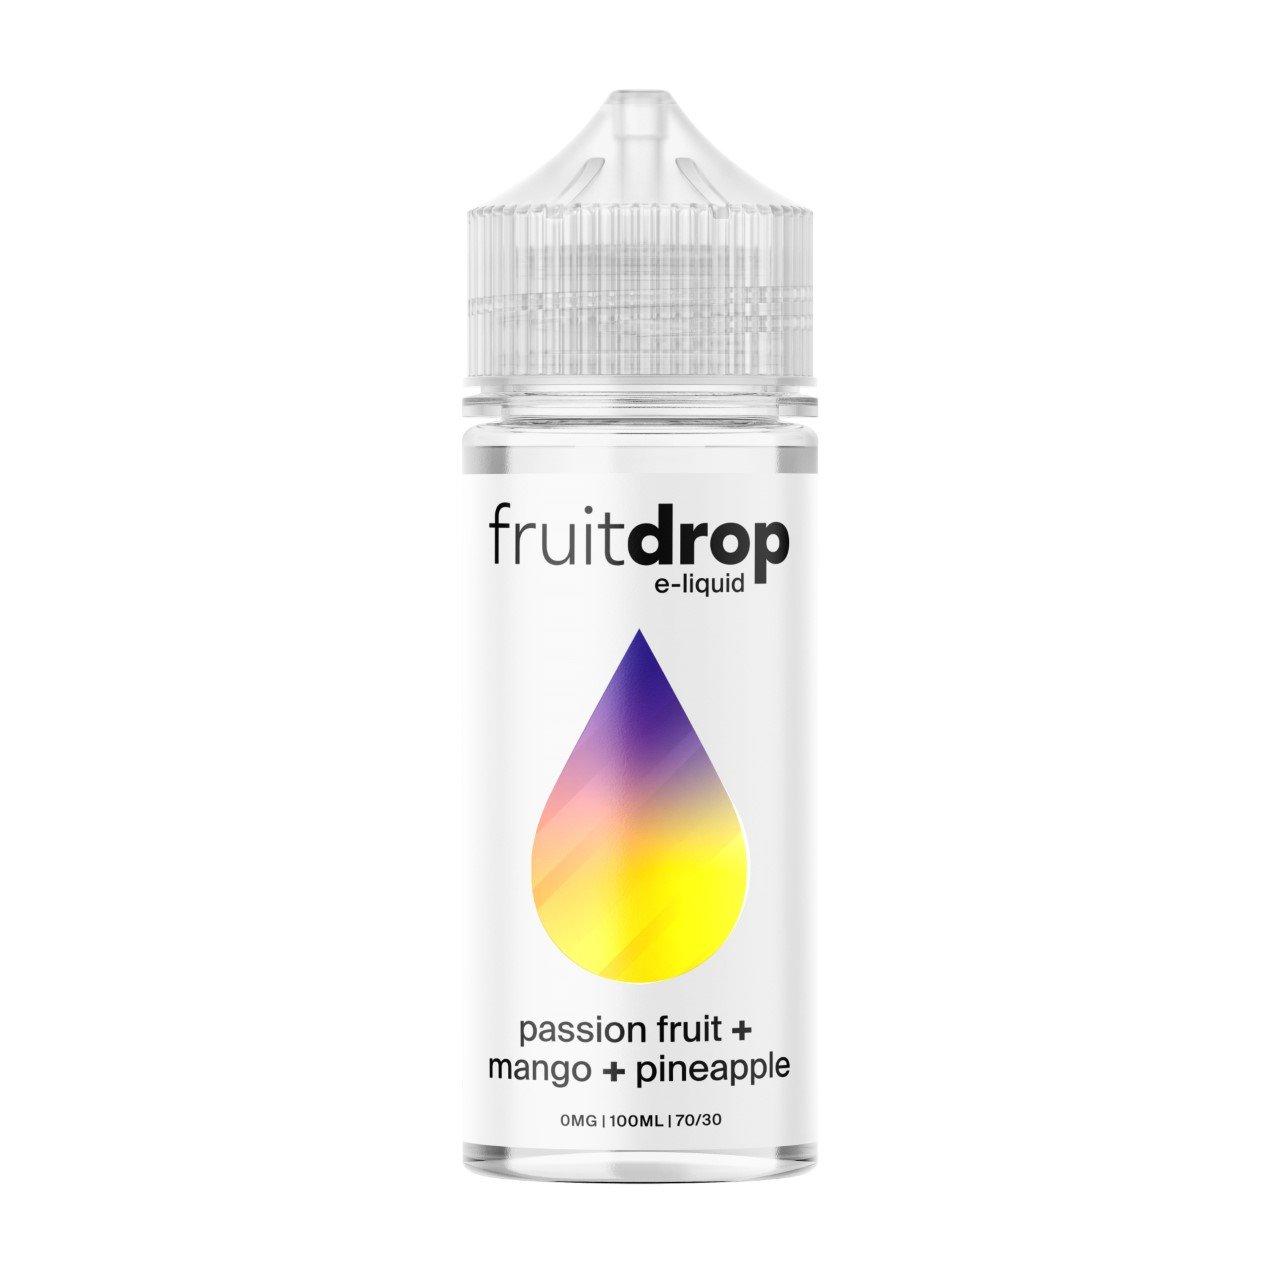 Fruit_Drop_100ml_Bottle_Mockup_Passion_Fruit_Mango_Pineapple